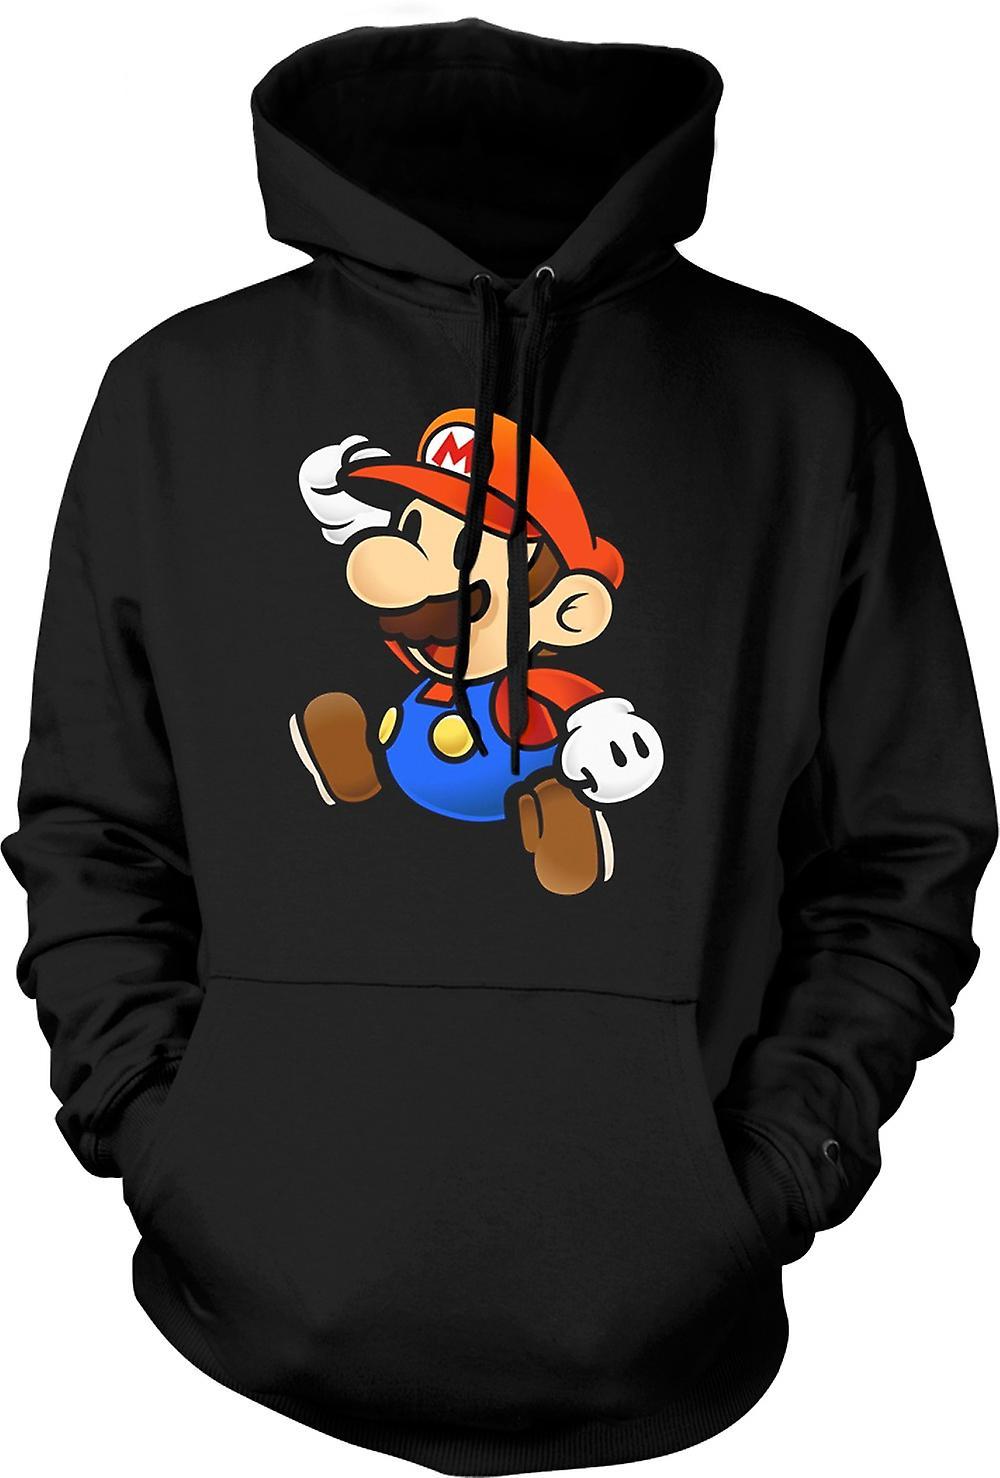 Mens Hoodie - Super Mario - Gamer